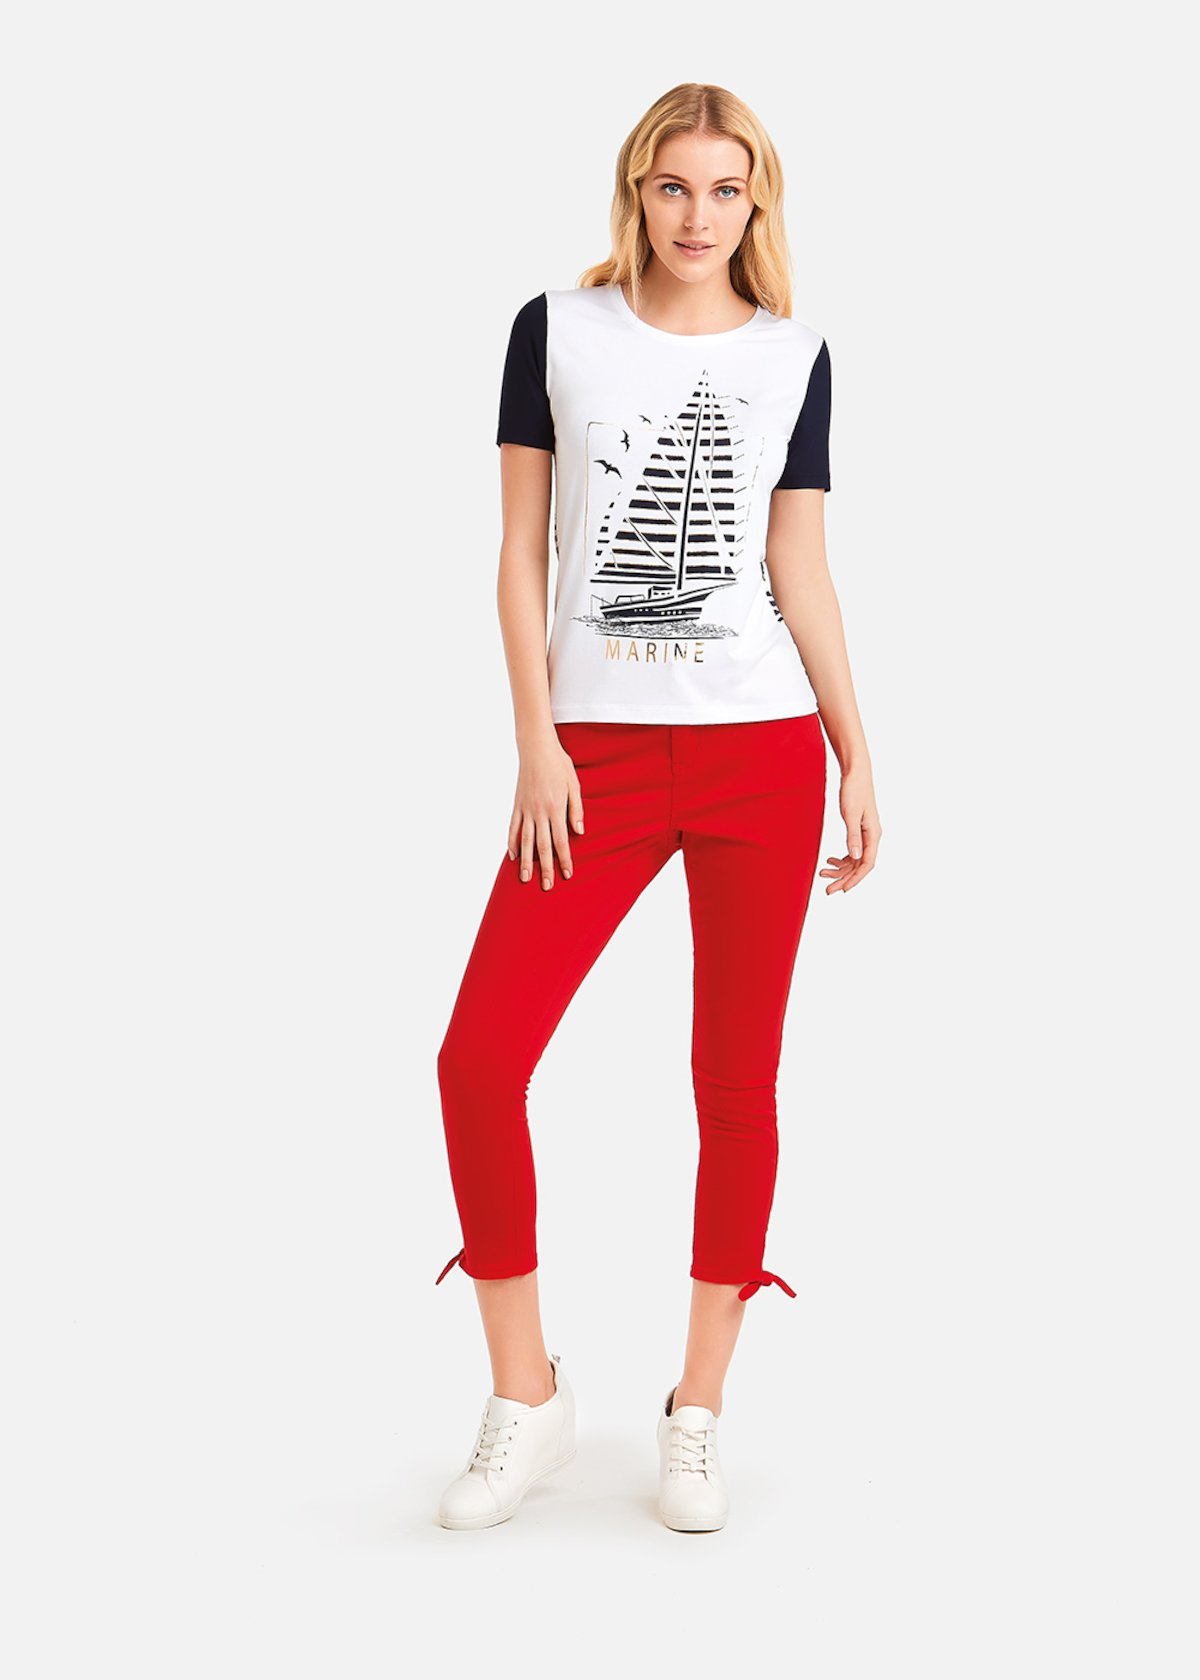 Sandry t-shirt mylar print - White\ Medium Blue